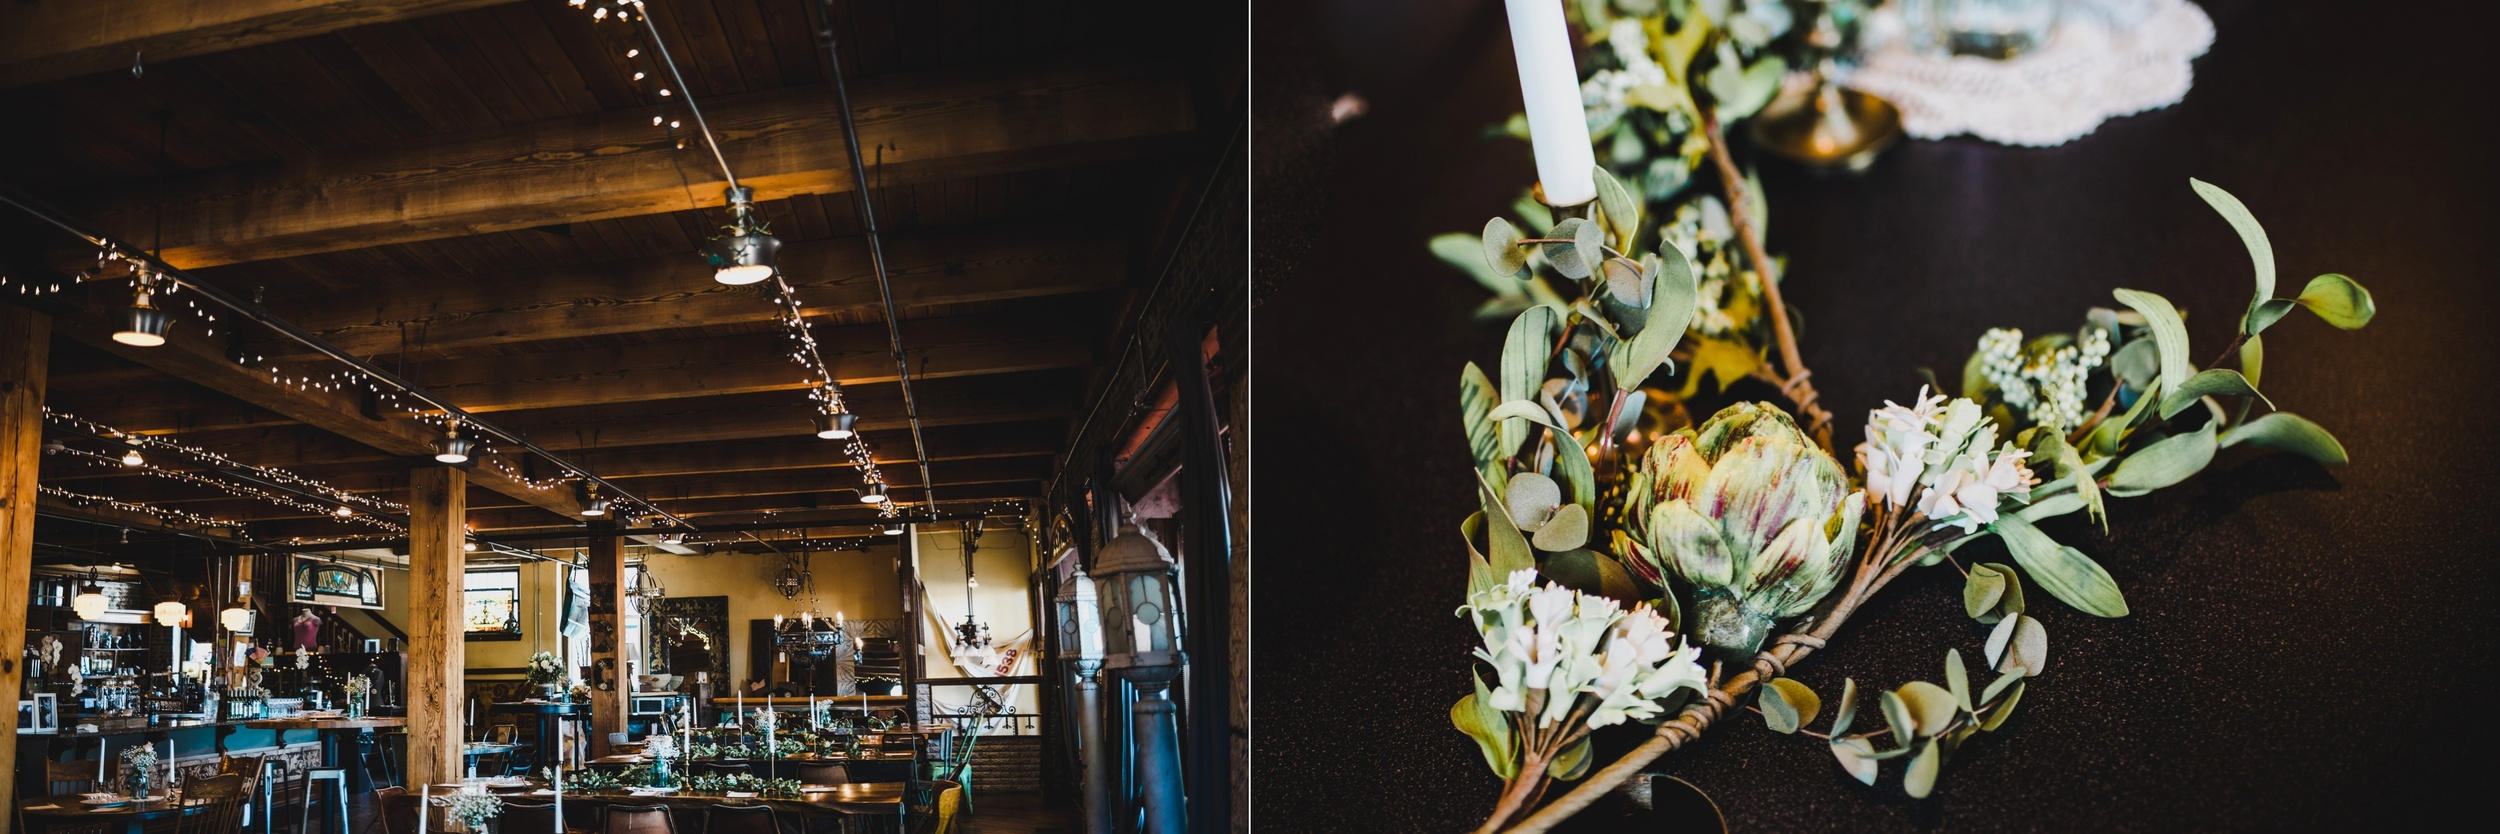 West End Architectural Salvage Wedding Photographer_2615.jpg